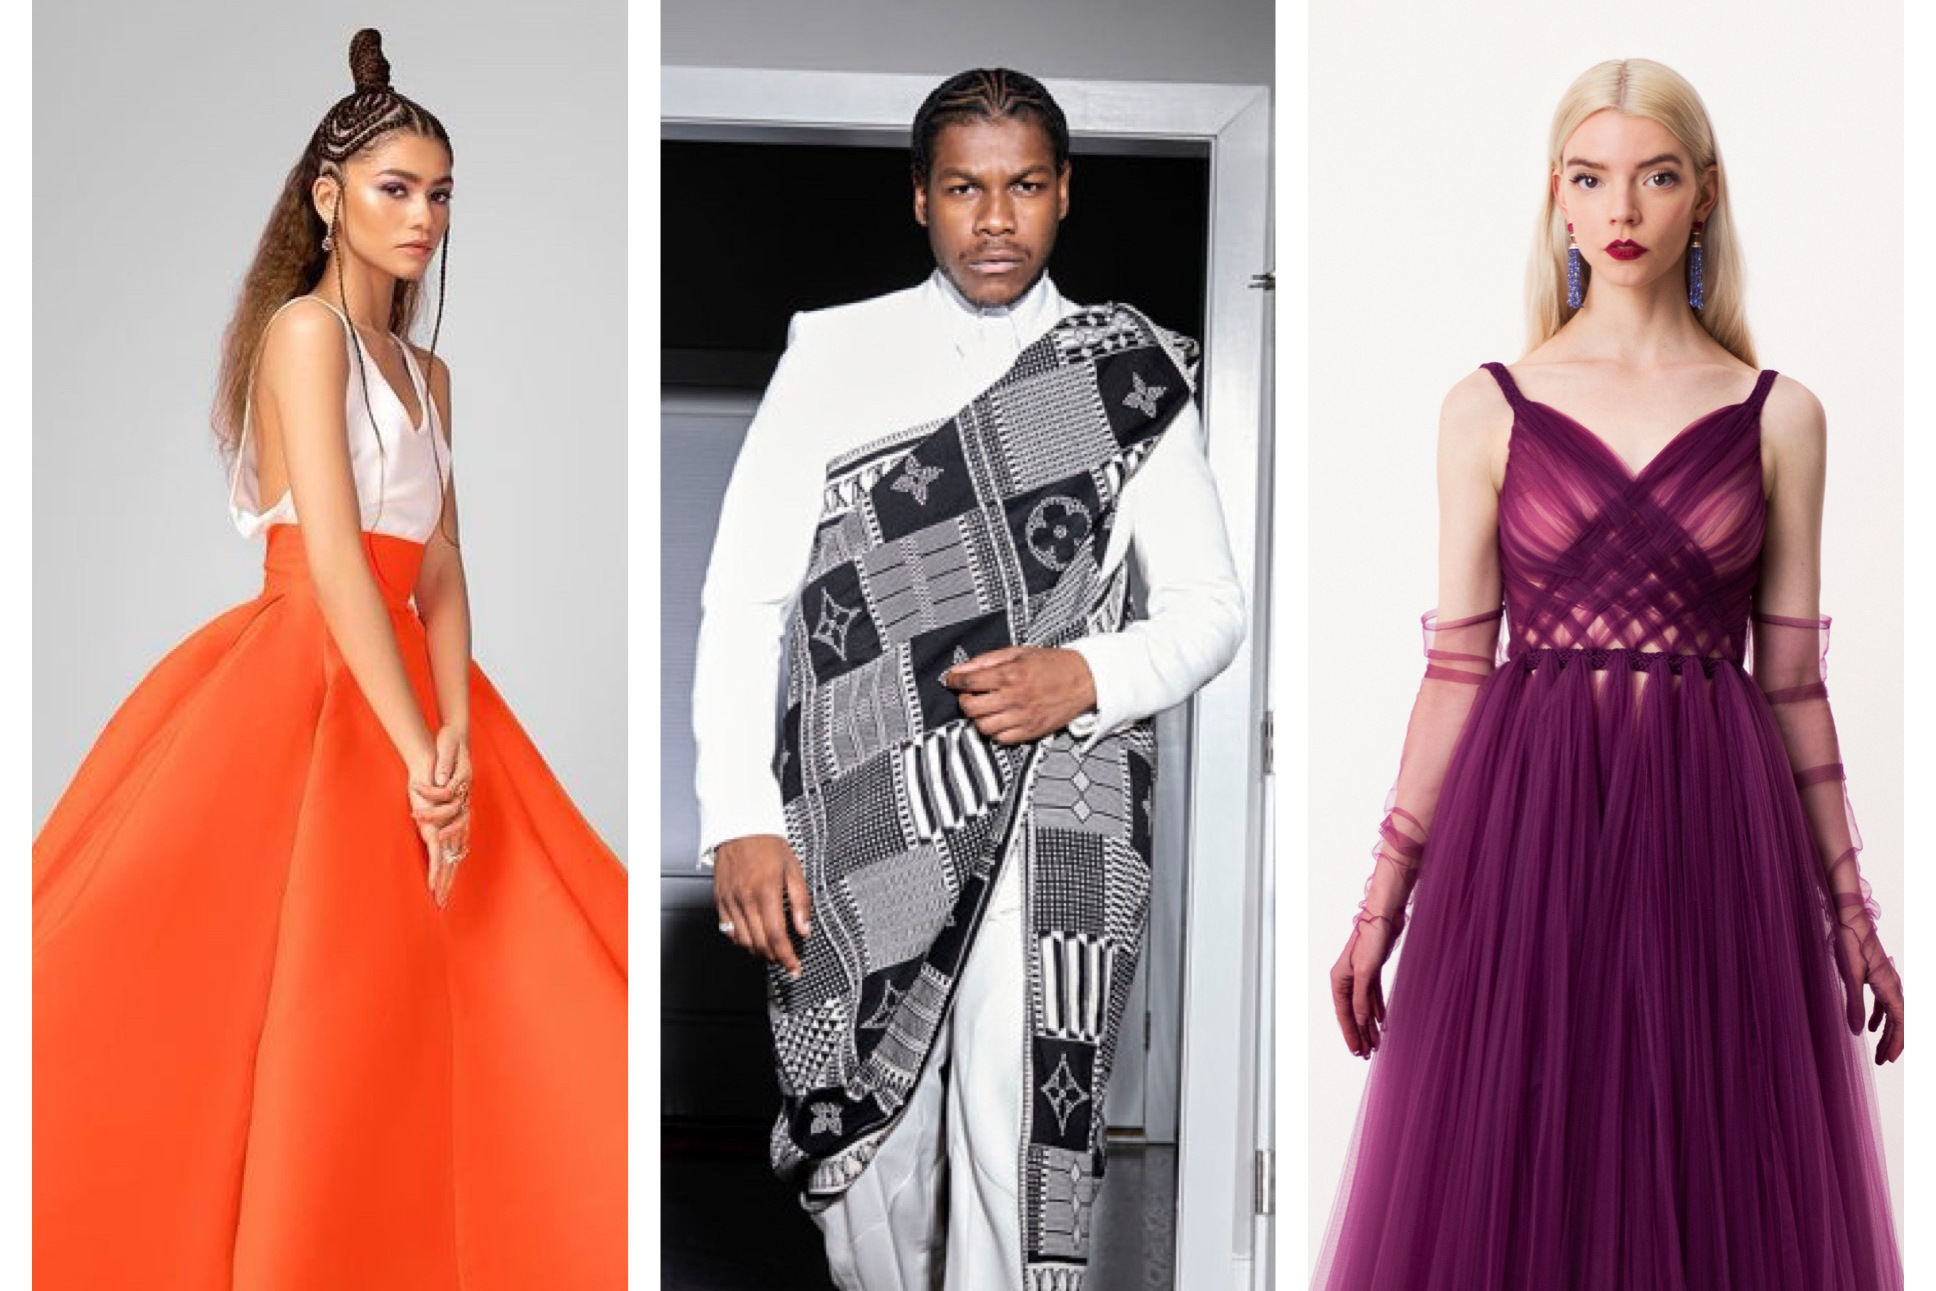 Critics' Choice Awards 2021 Fashion: Best Red Carpet Looks